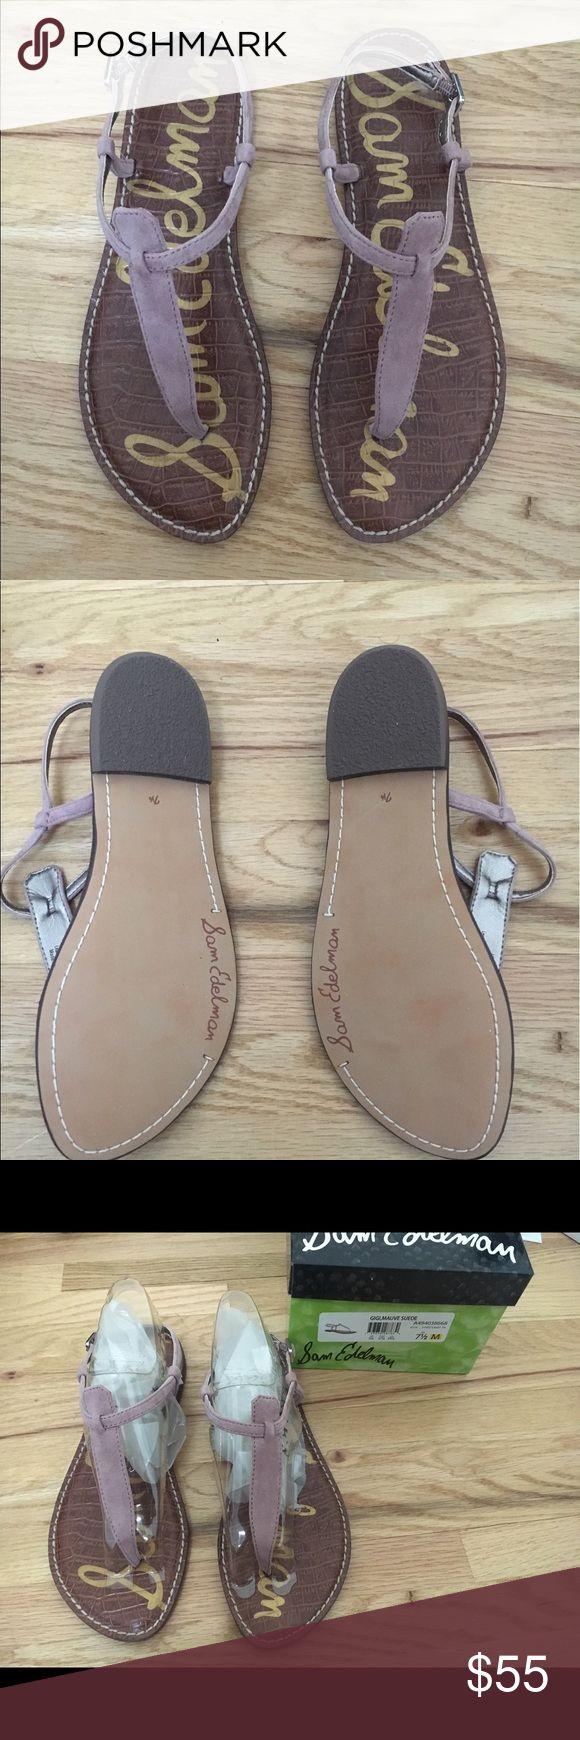 Sam Edelman Gigi Mauve Suede Sandals- Brand New The classic Sam Edelman Gigi sandal. Beautiful Mauve. Brand new- Never Worn. Size 7.5 Sam Edelman Shoes Sandals